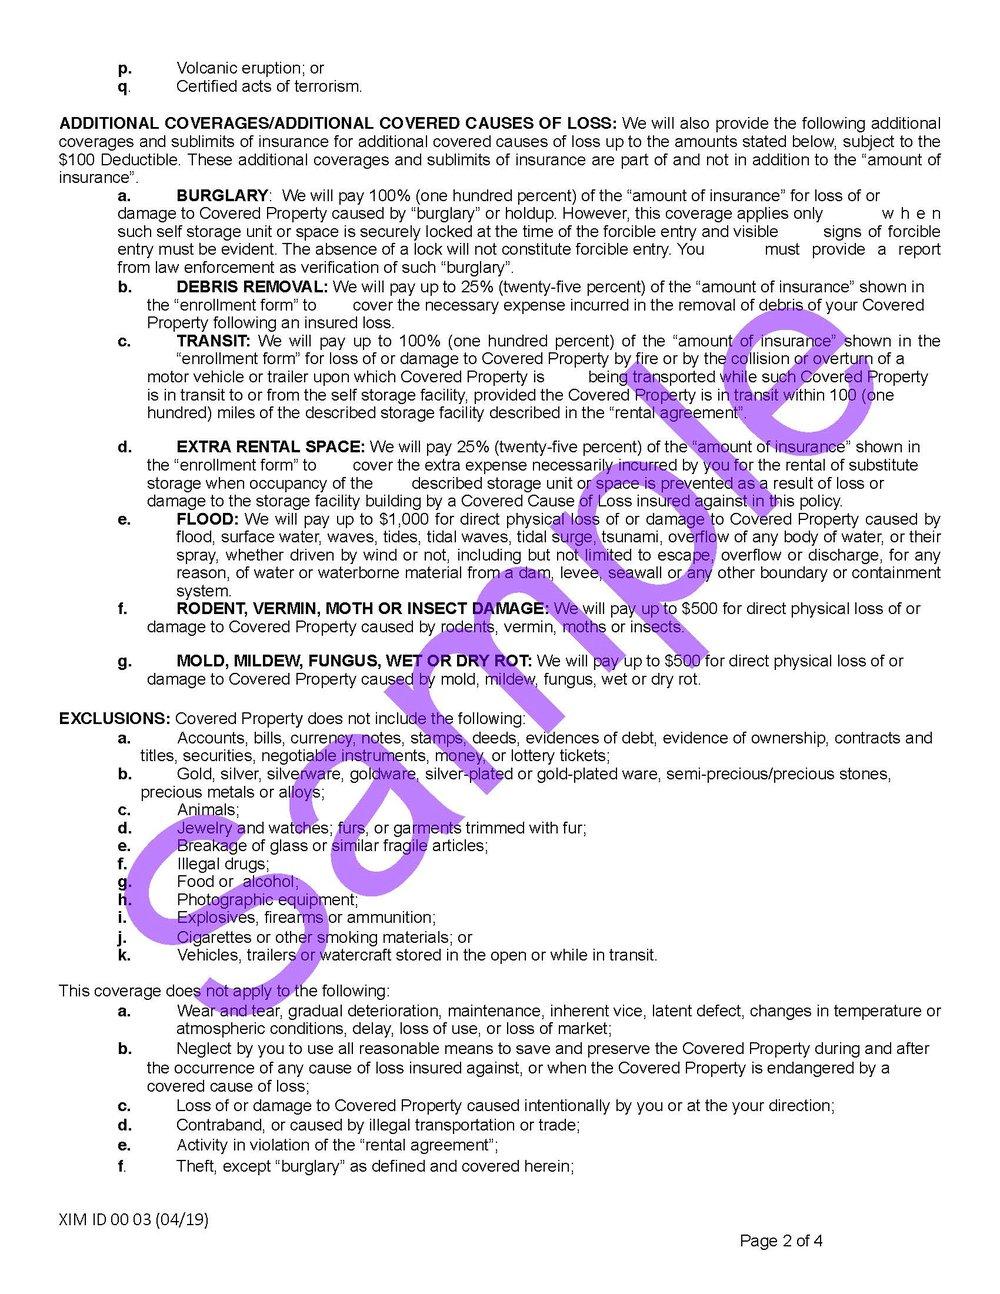 XIM ID 00 03 04 19 Idaho Certificate of InsuranceSample_Page_2.jpg